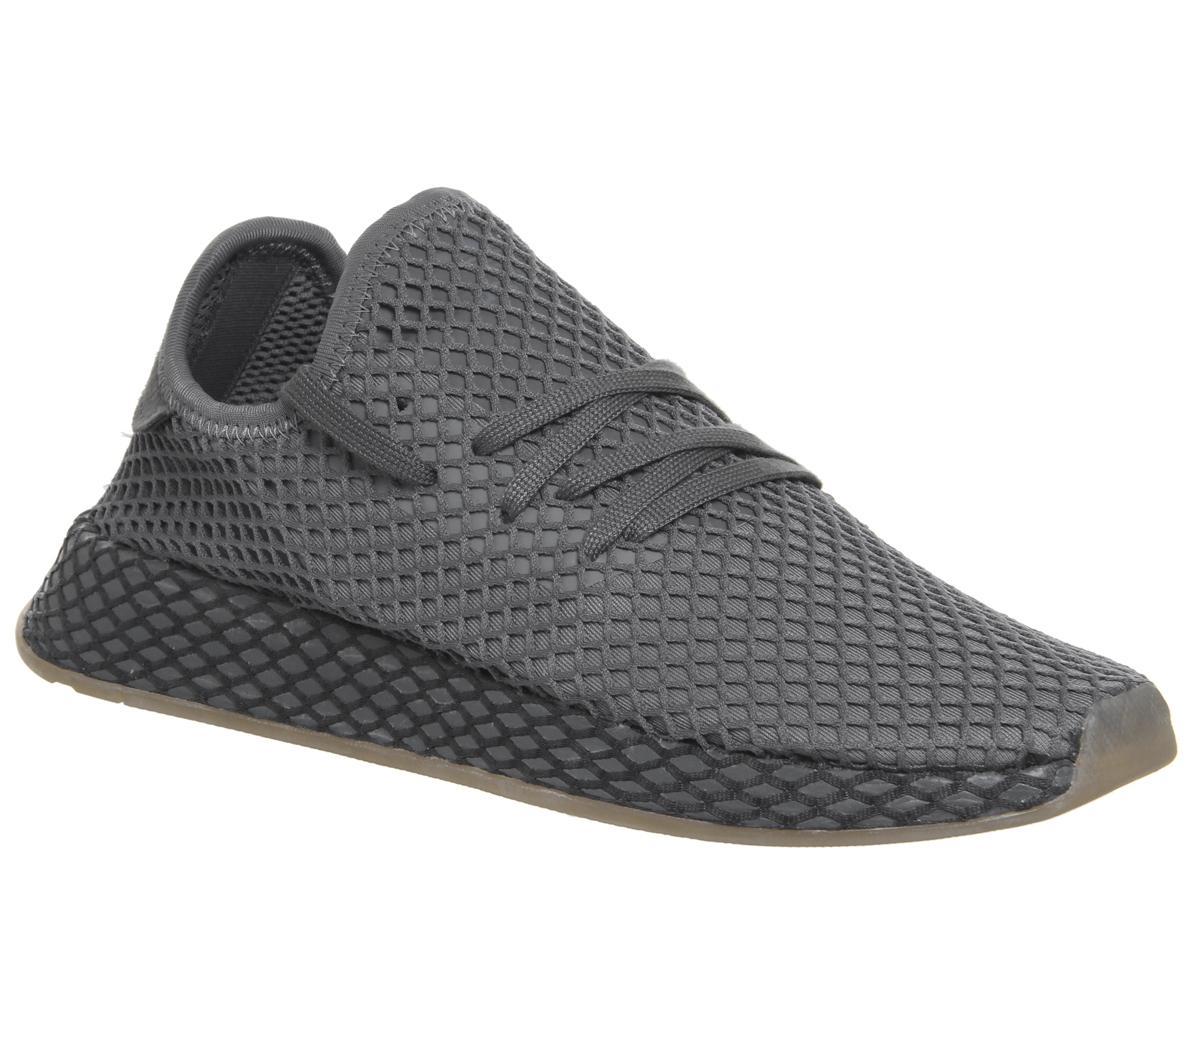 adidas Deerupt Trainers Grey Grey White